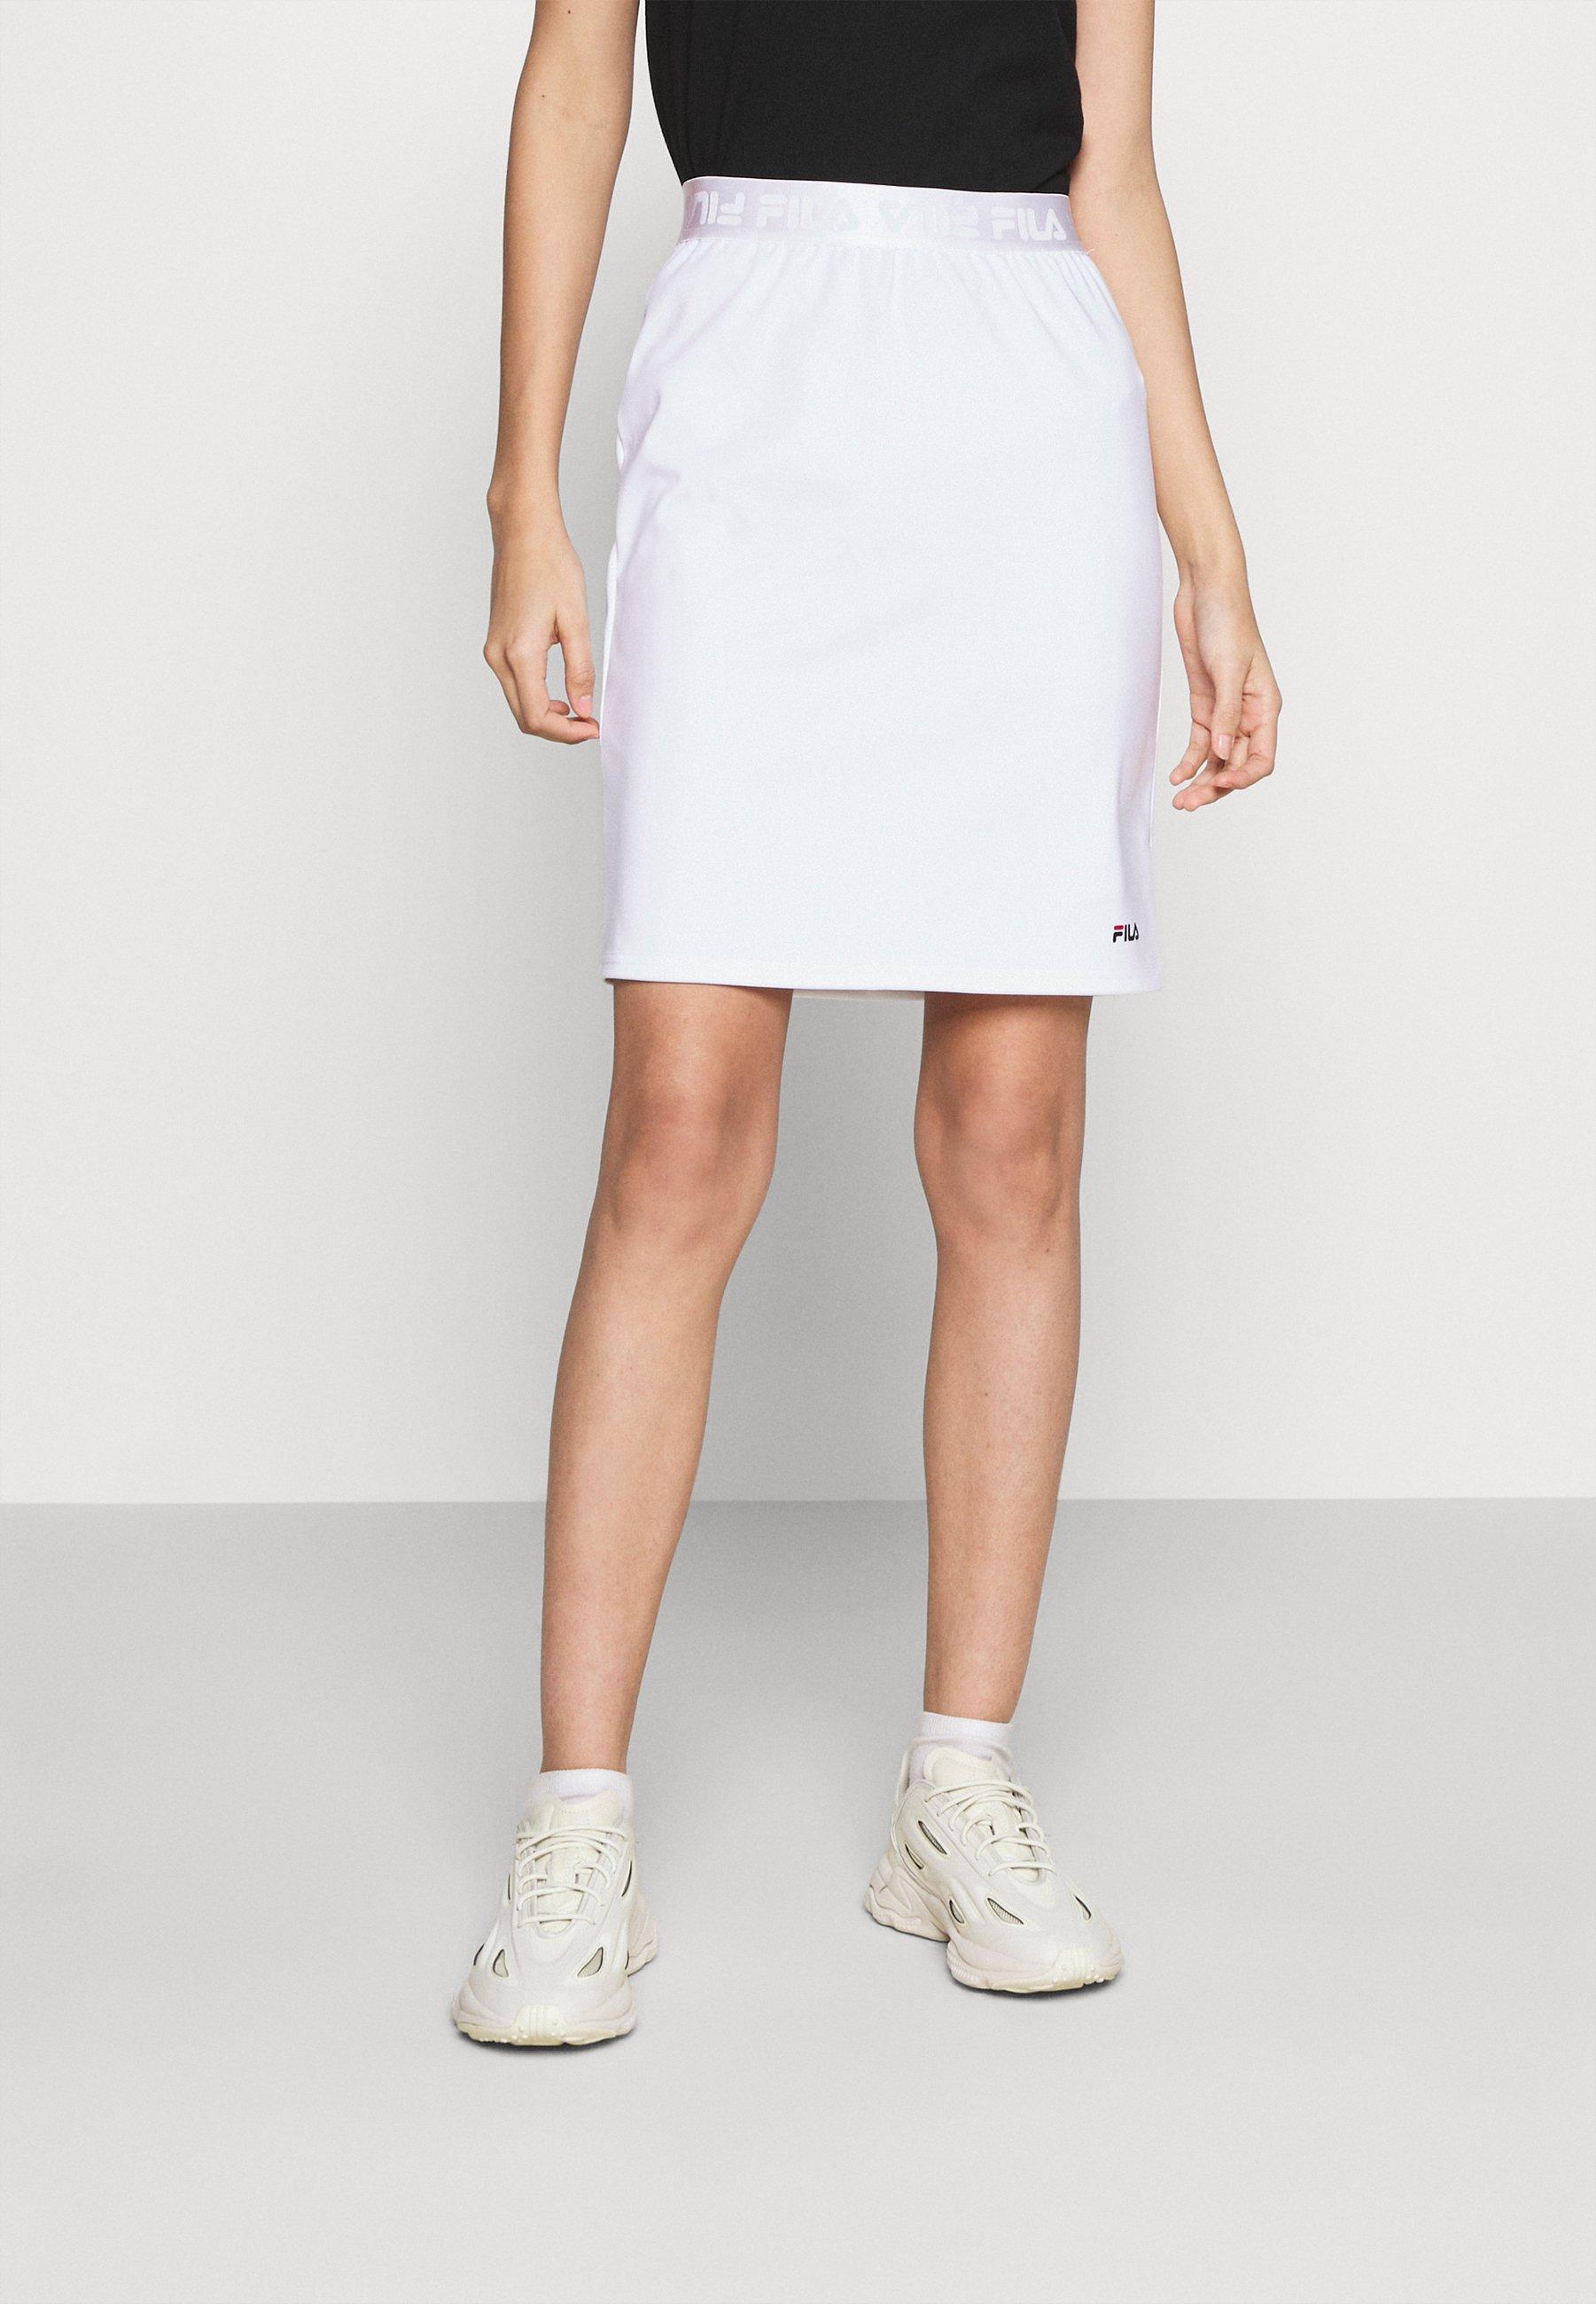 Femme CHESS SKIRT - Minijupe